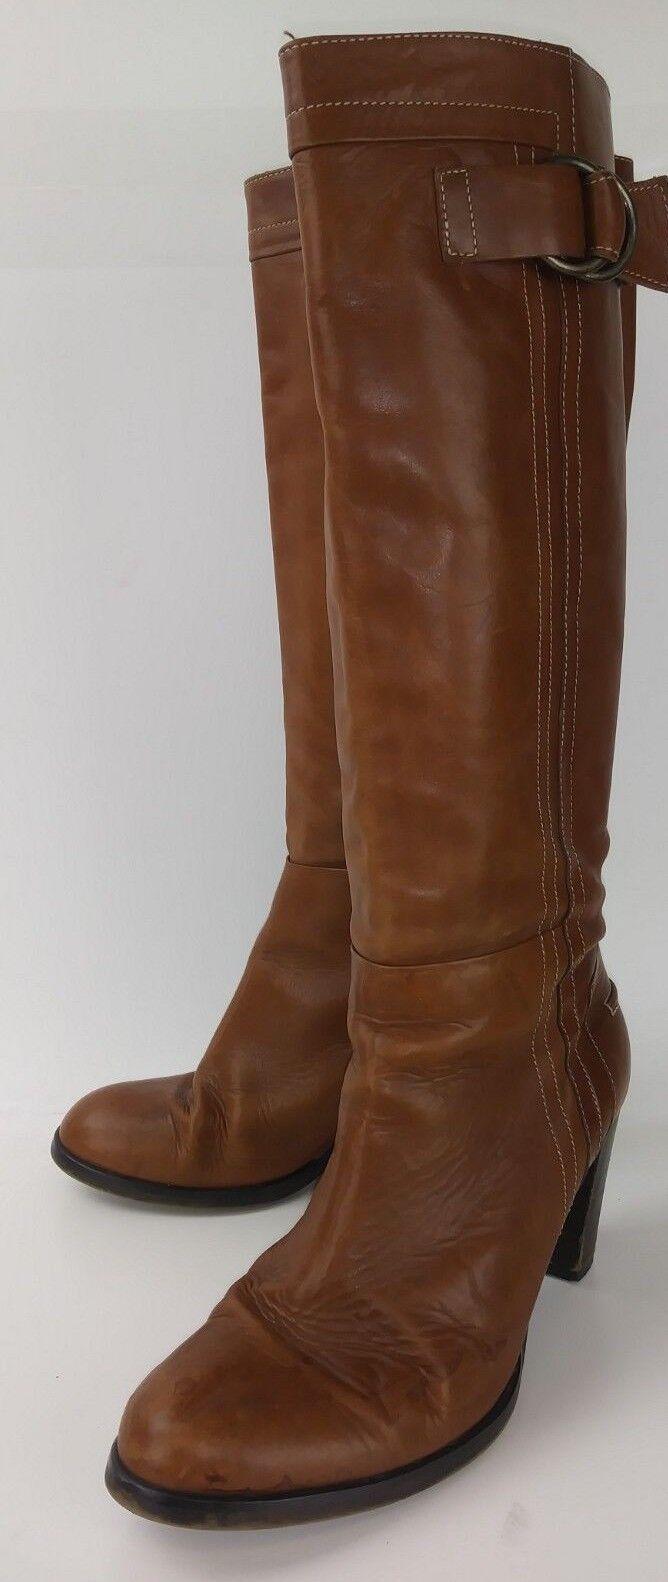 Damenschuhe 2009006 Stiefel Tall US 9 Braun Leder Casual Heels  2780